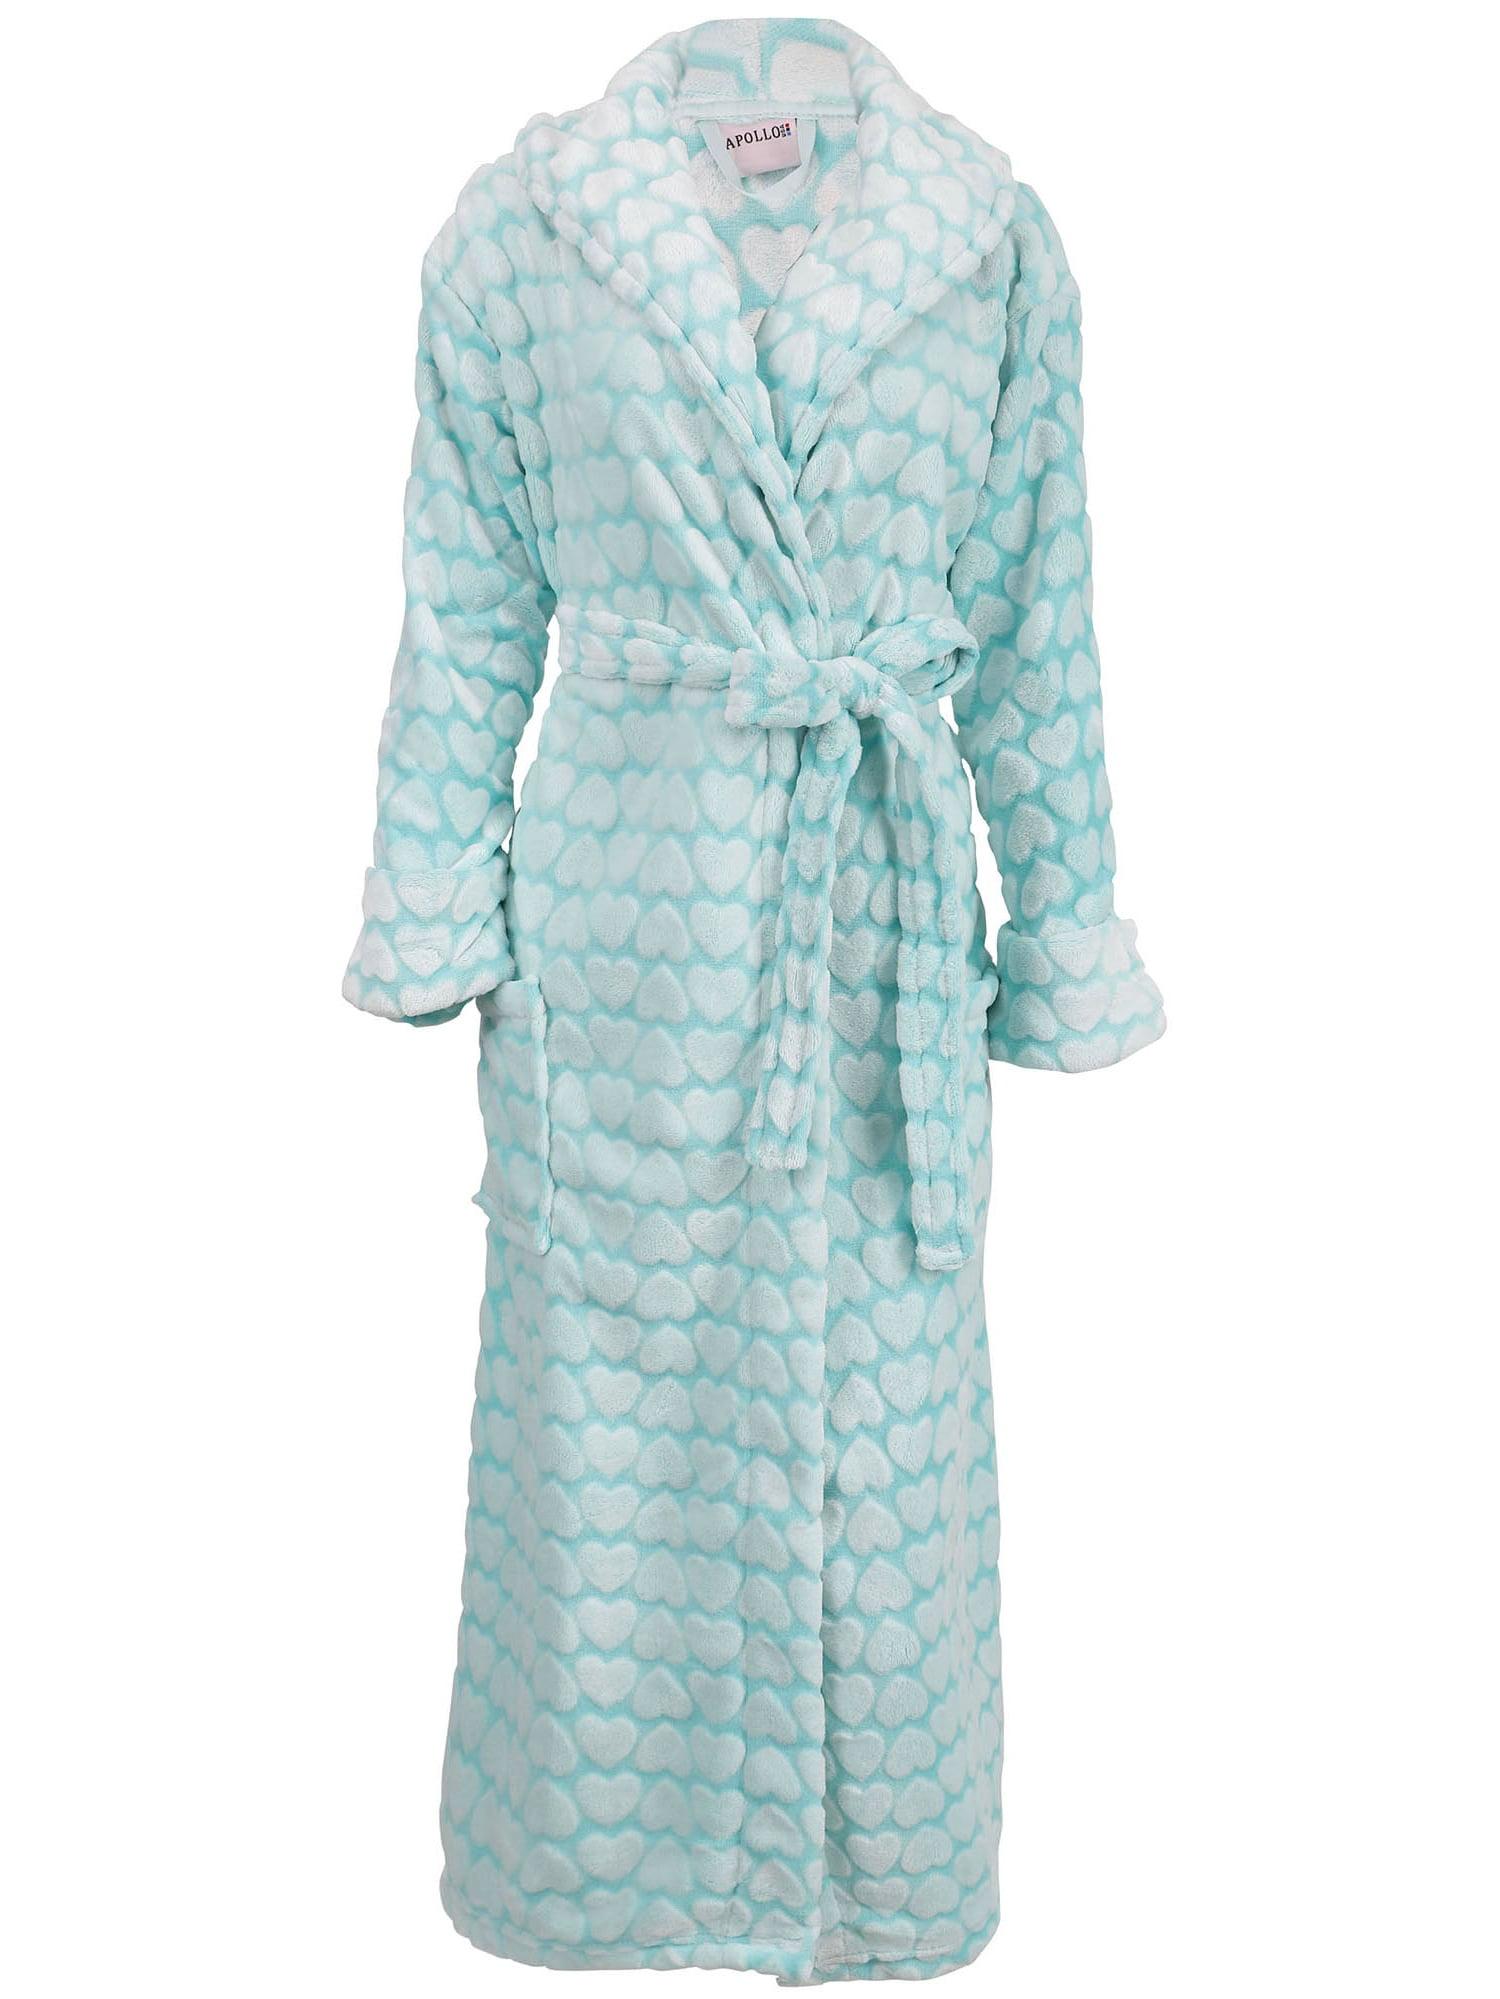 Women's Soft Plush Shawl Collar Bathrobe Kimono Robe Sleepwear,Blue